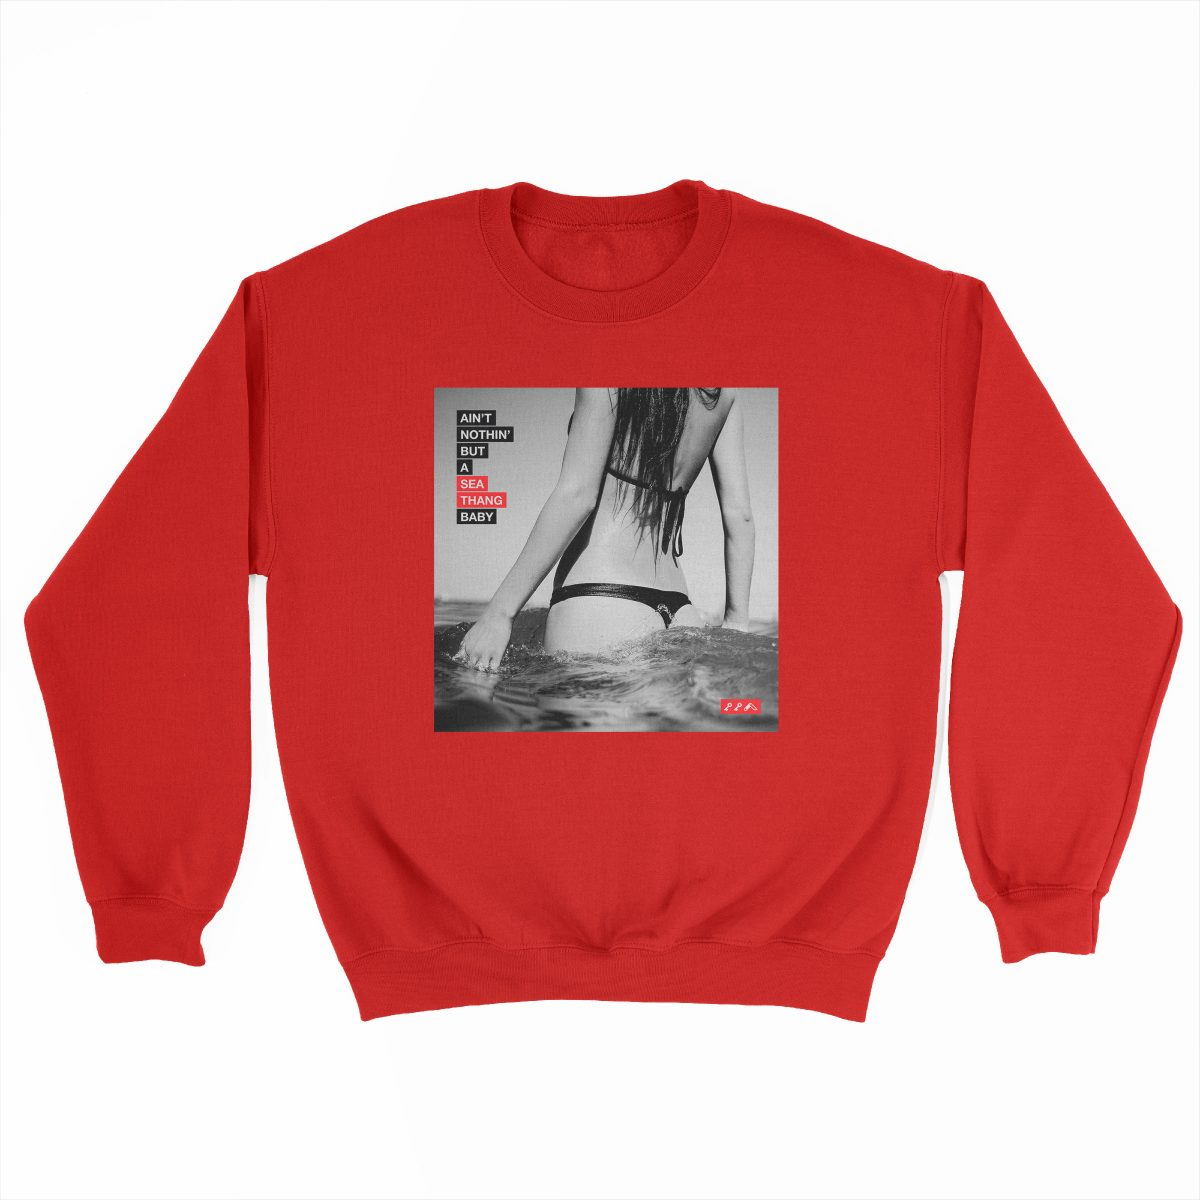 SEA THANG sexy ocean gangsta rap graphic on a red sweatshirt at kikicutt.com